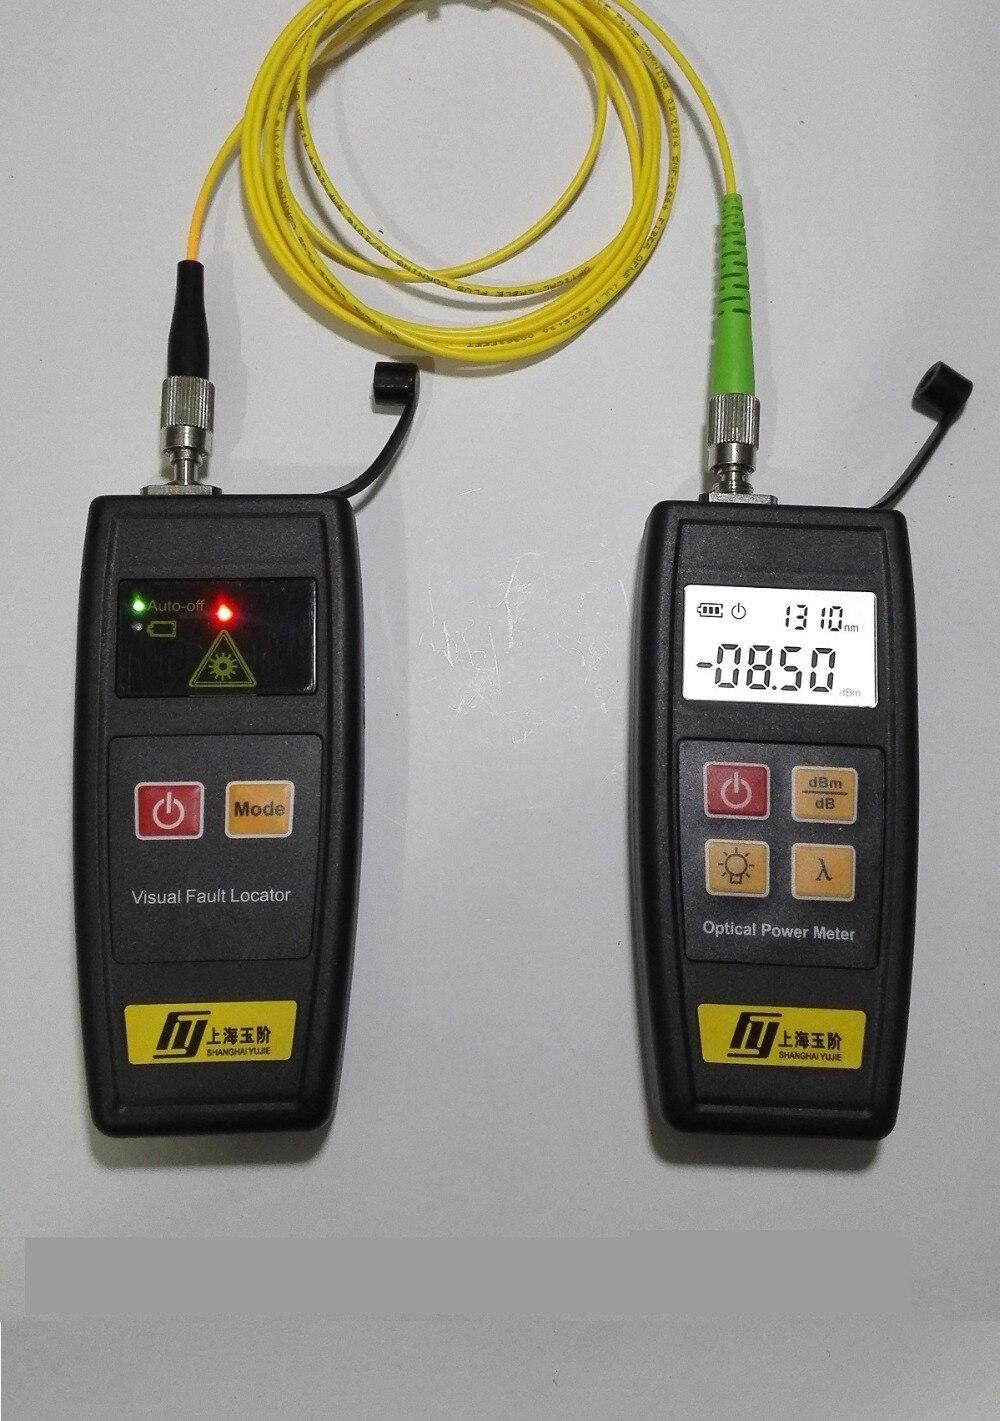 2 in 1 FTTH Werkzeuge mit Mini Optical Fiber Power Meter und Visual Fault Locator 50MW VFL Fiber Optic kabel Tester